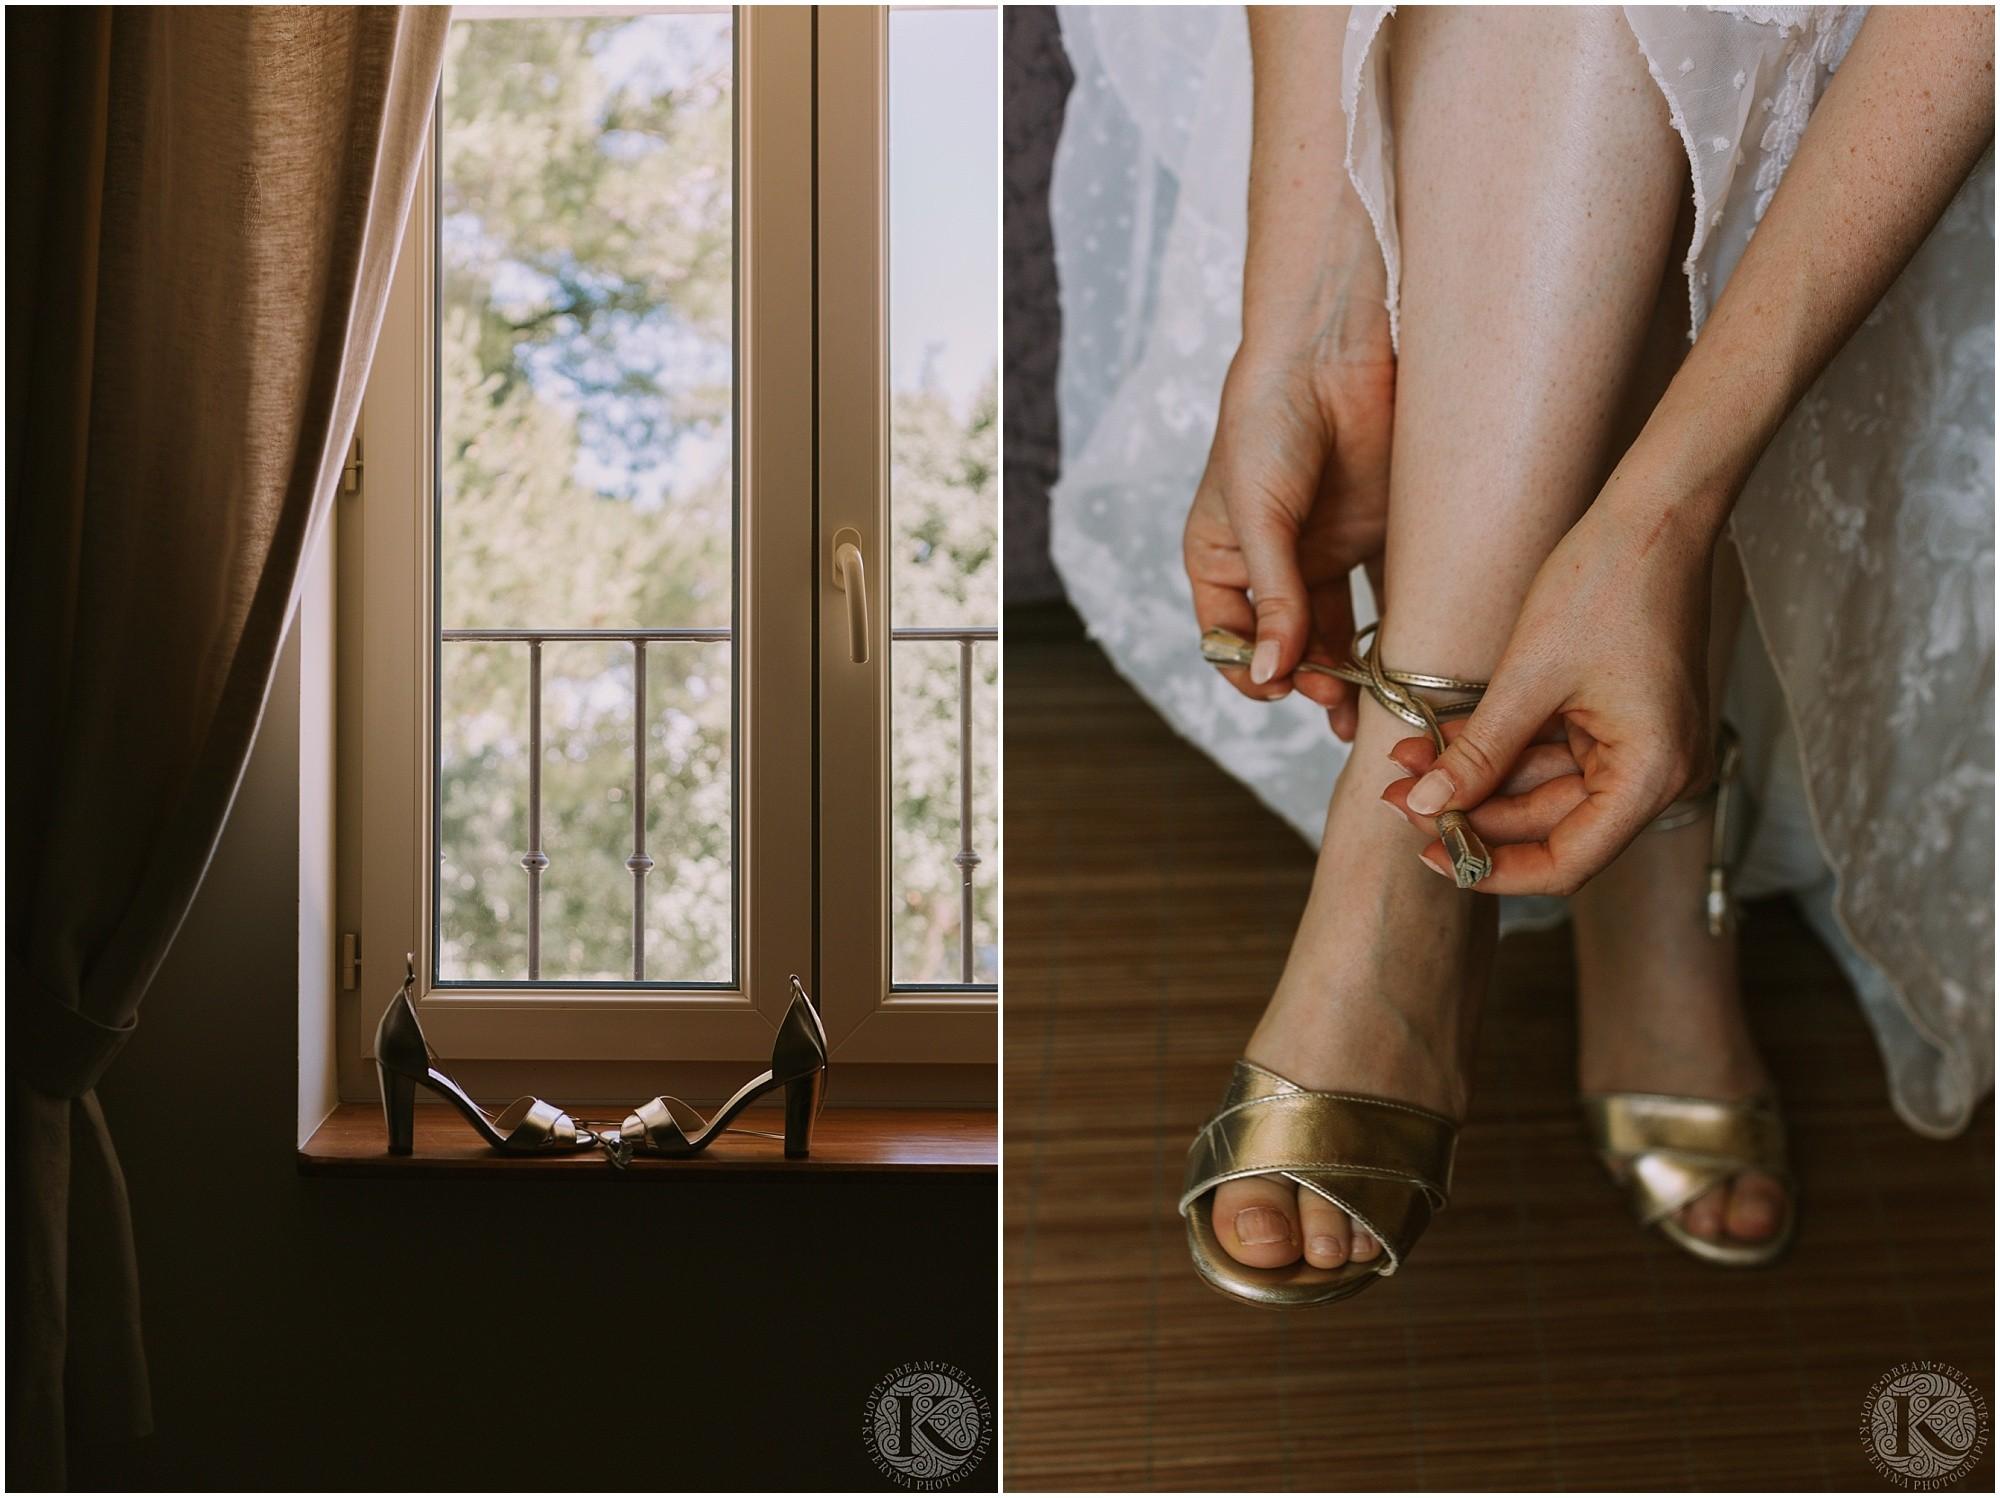 Kateryna-photos-photographe-mariage-vaucluse-provence-avignon-ferme-st-hugues_0013.jpg